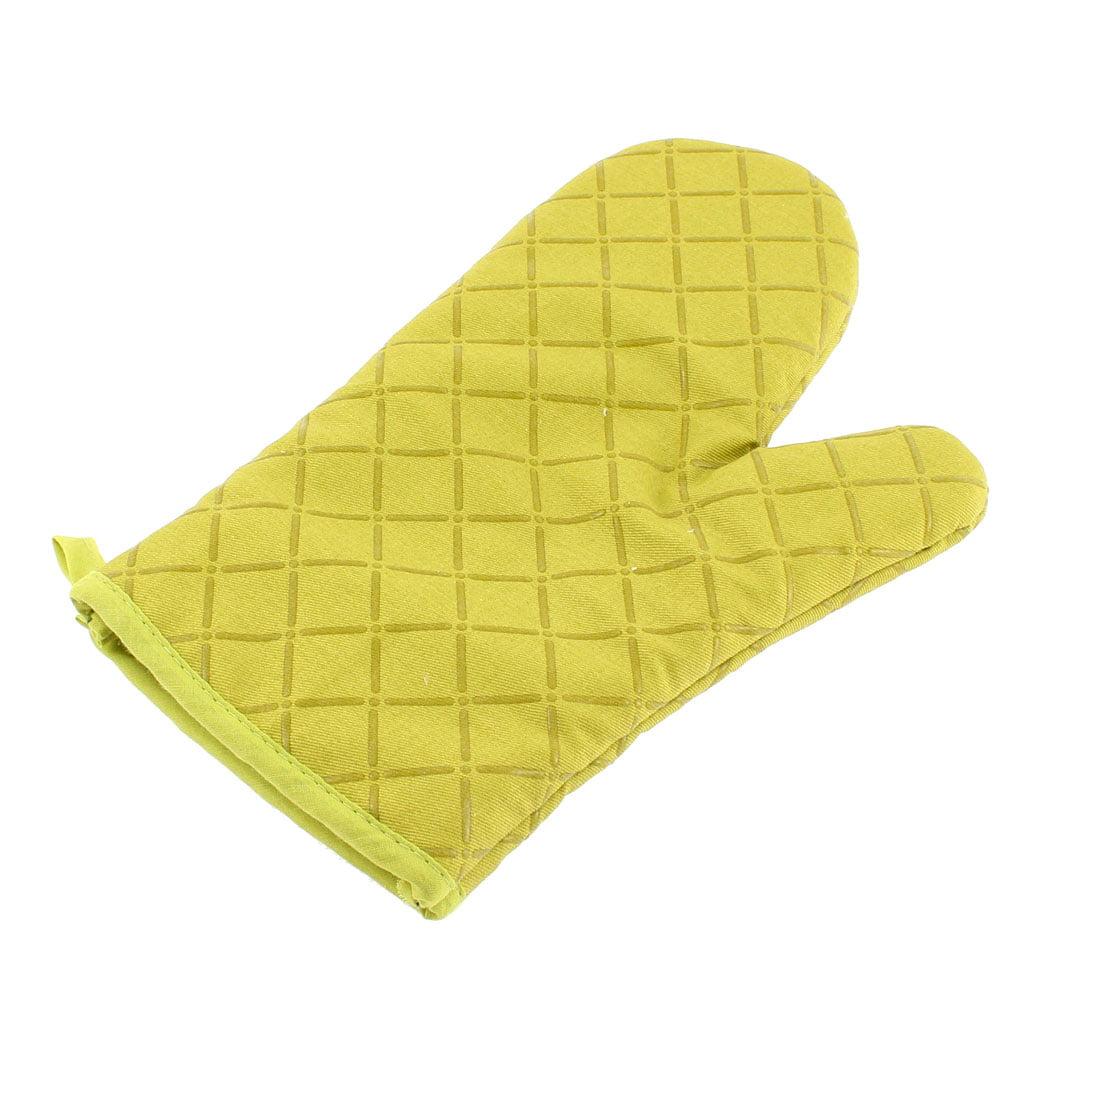 Kitchen Microwave Baking Cross Pattern Heat Resistance Mitten Glove Green - image 3 of 3